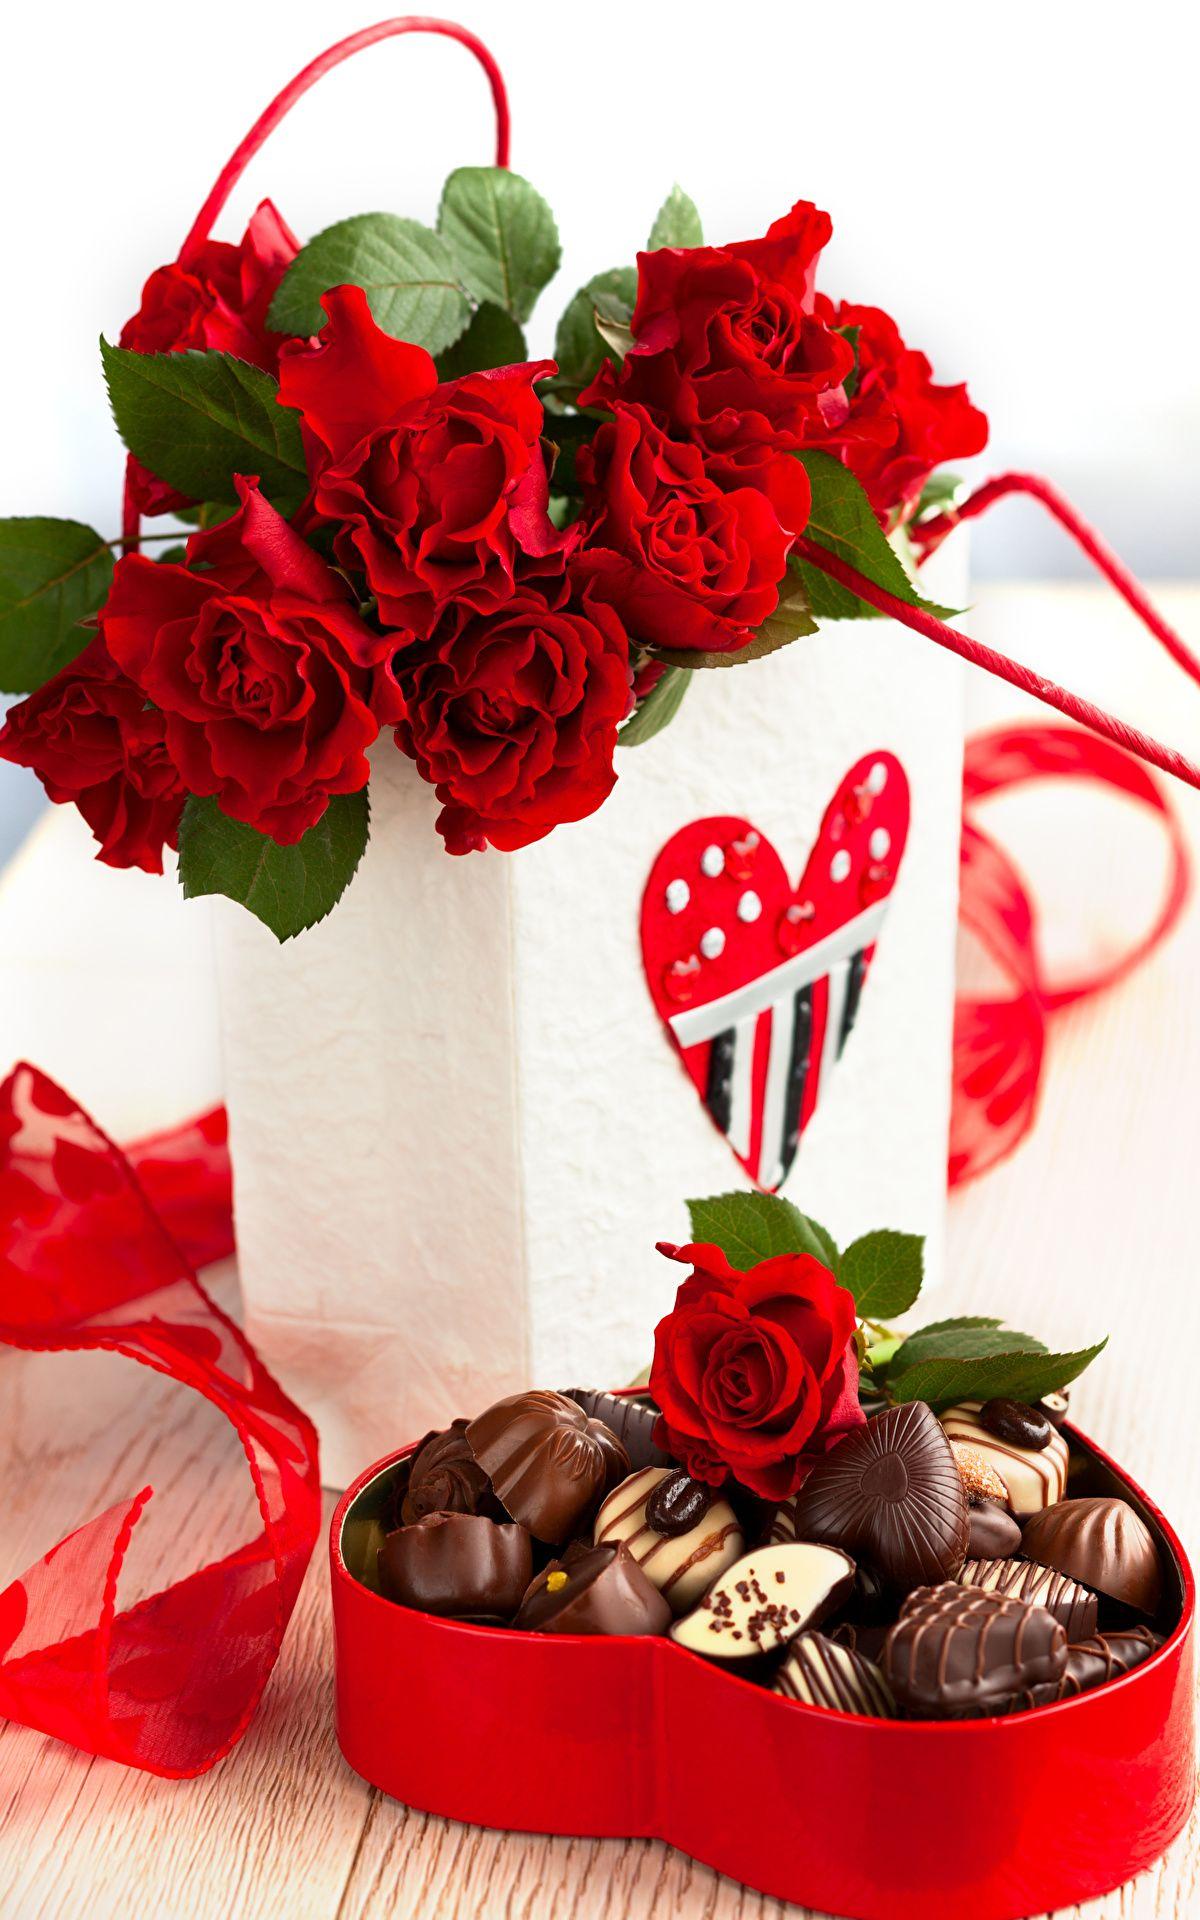 Znalezione Obrazy Dla Zapytania Czekoladki Na Dzien Kobiet Cute Valentines Day Gifts Valentines Roses Valentine Day Gifts